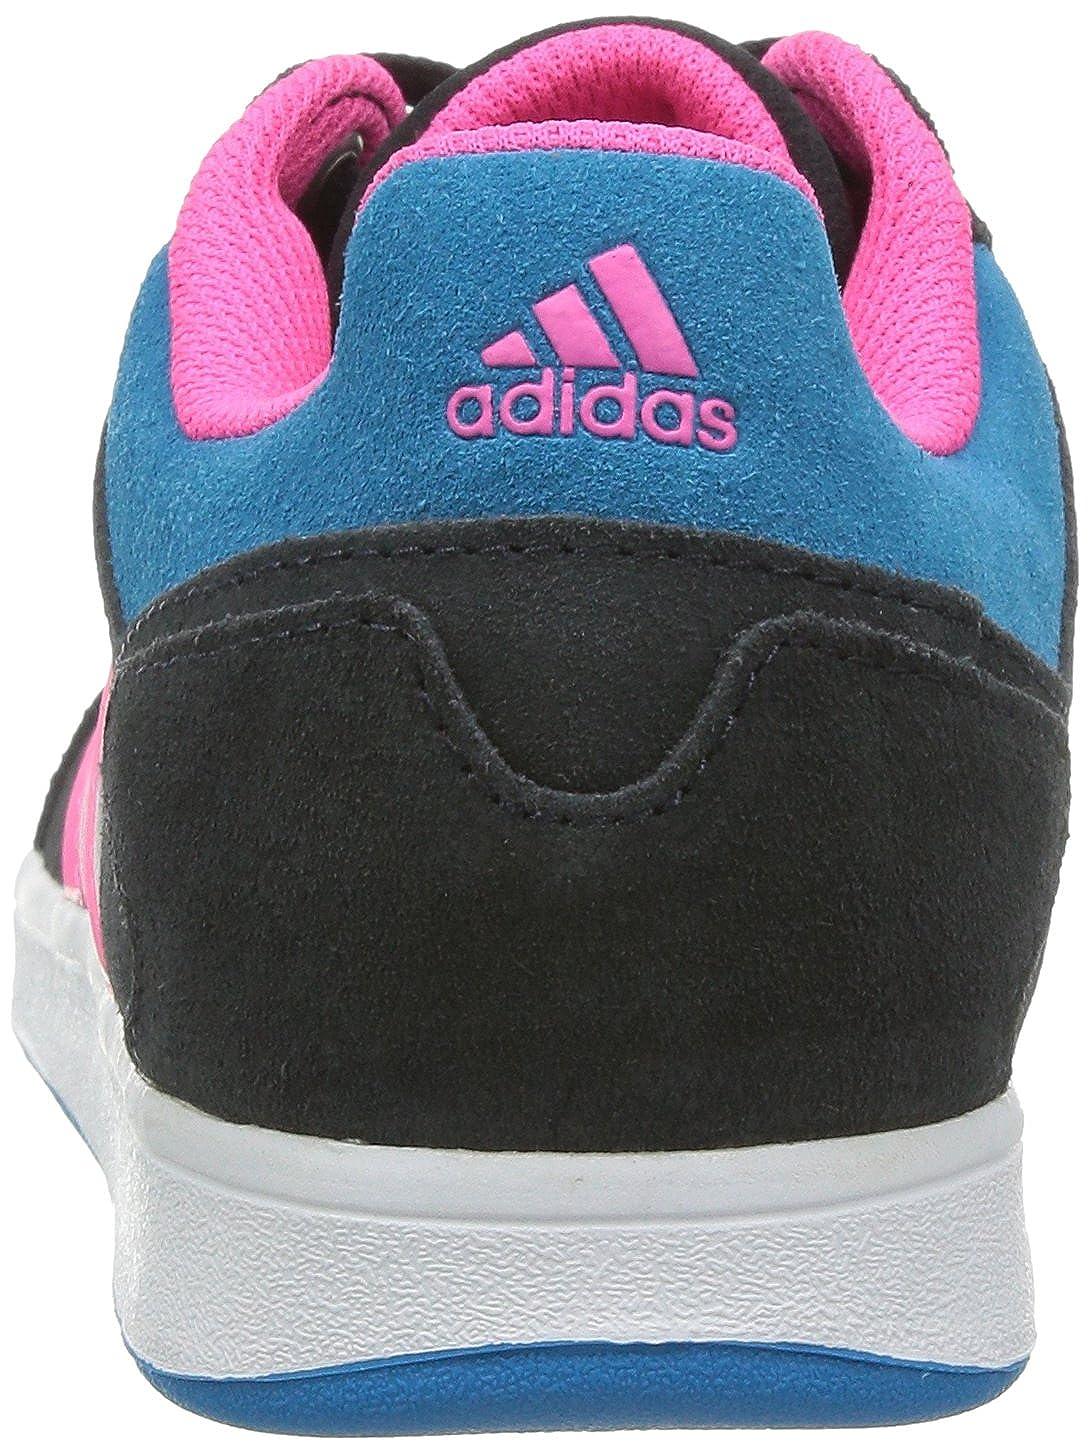 Adidas Oracle VI Str W M25371 Turnschuhe Damenschuhe Turnschuhe M25371 08b9aa